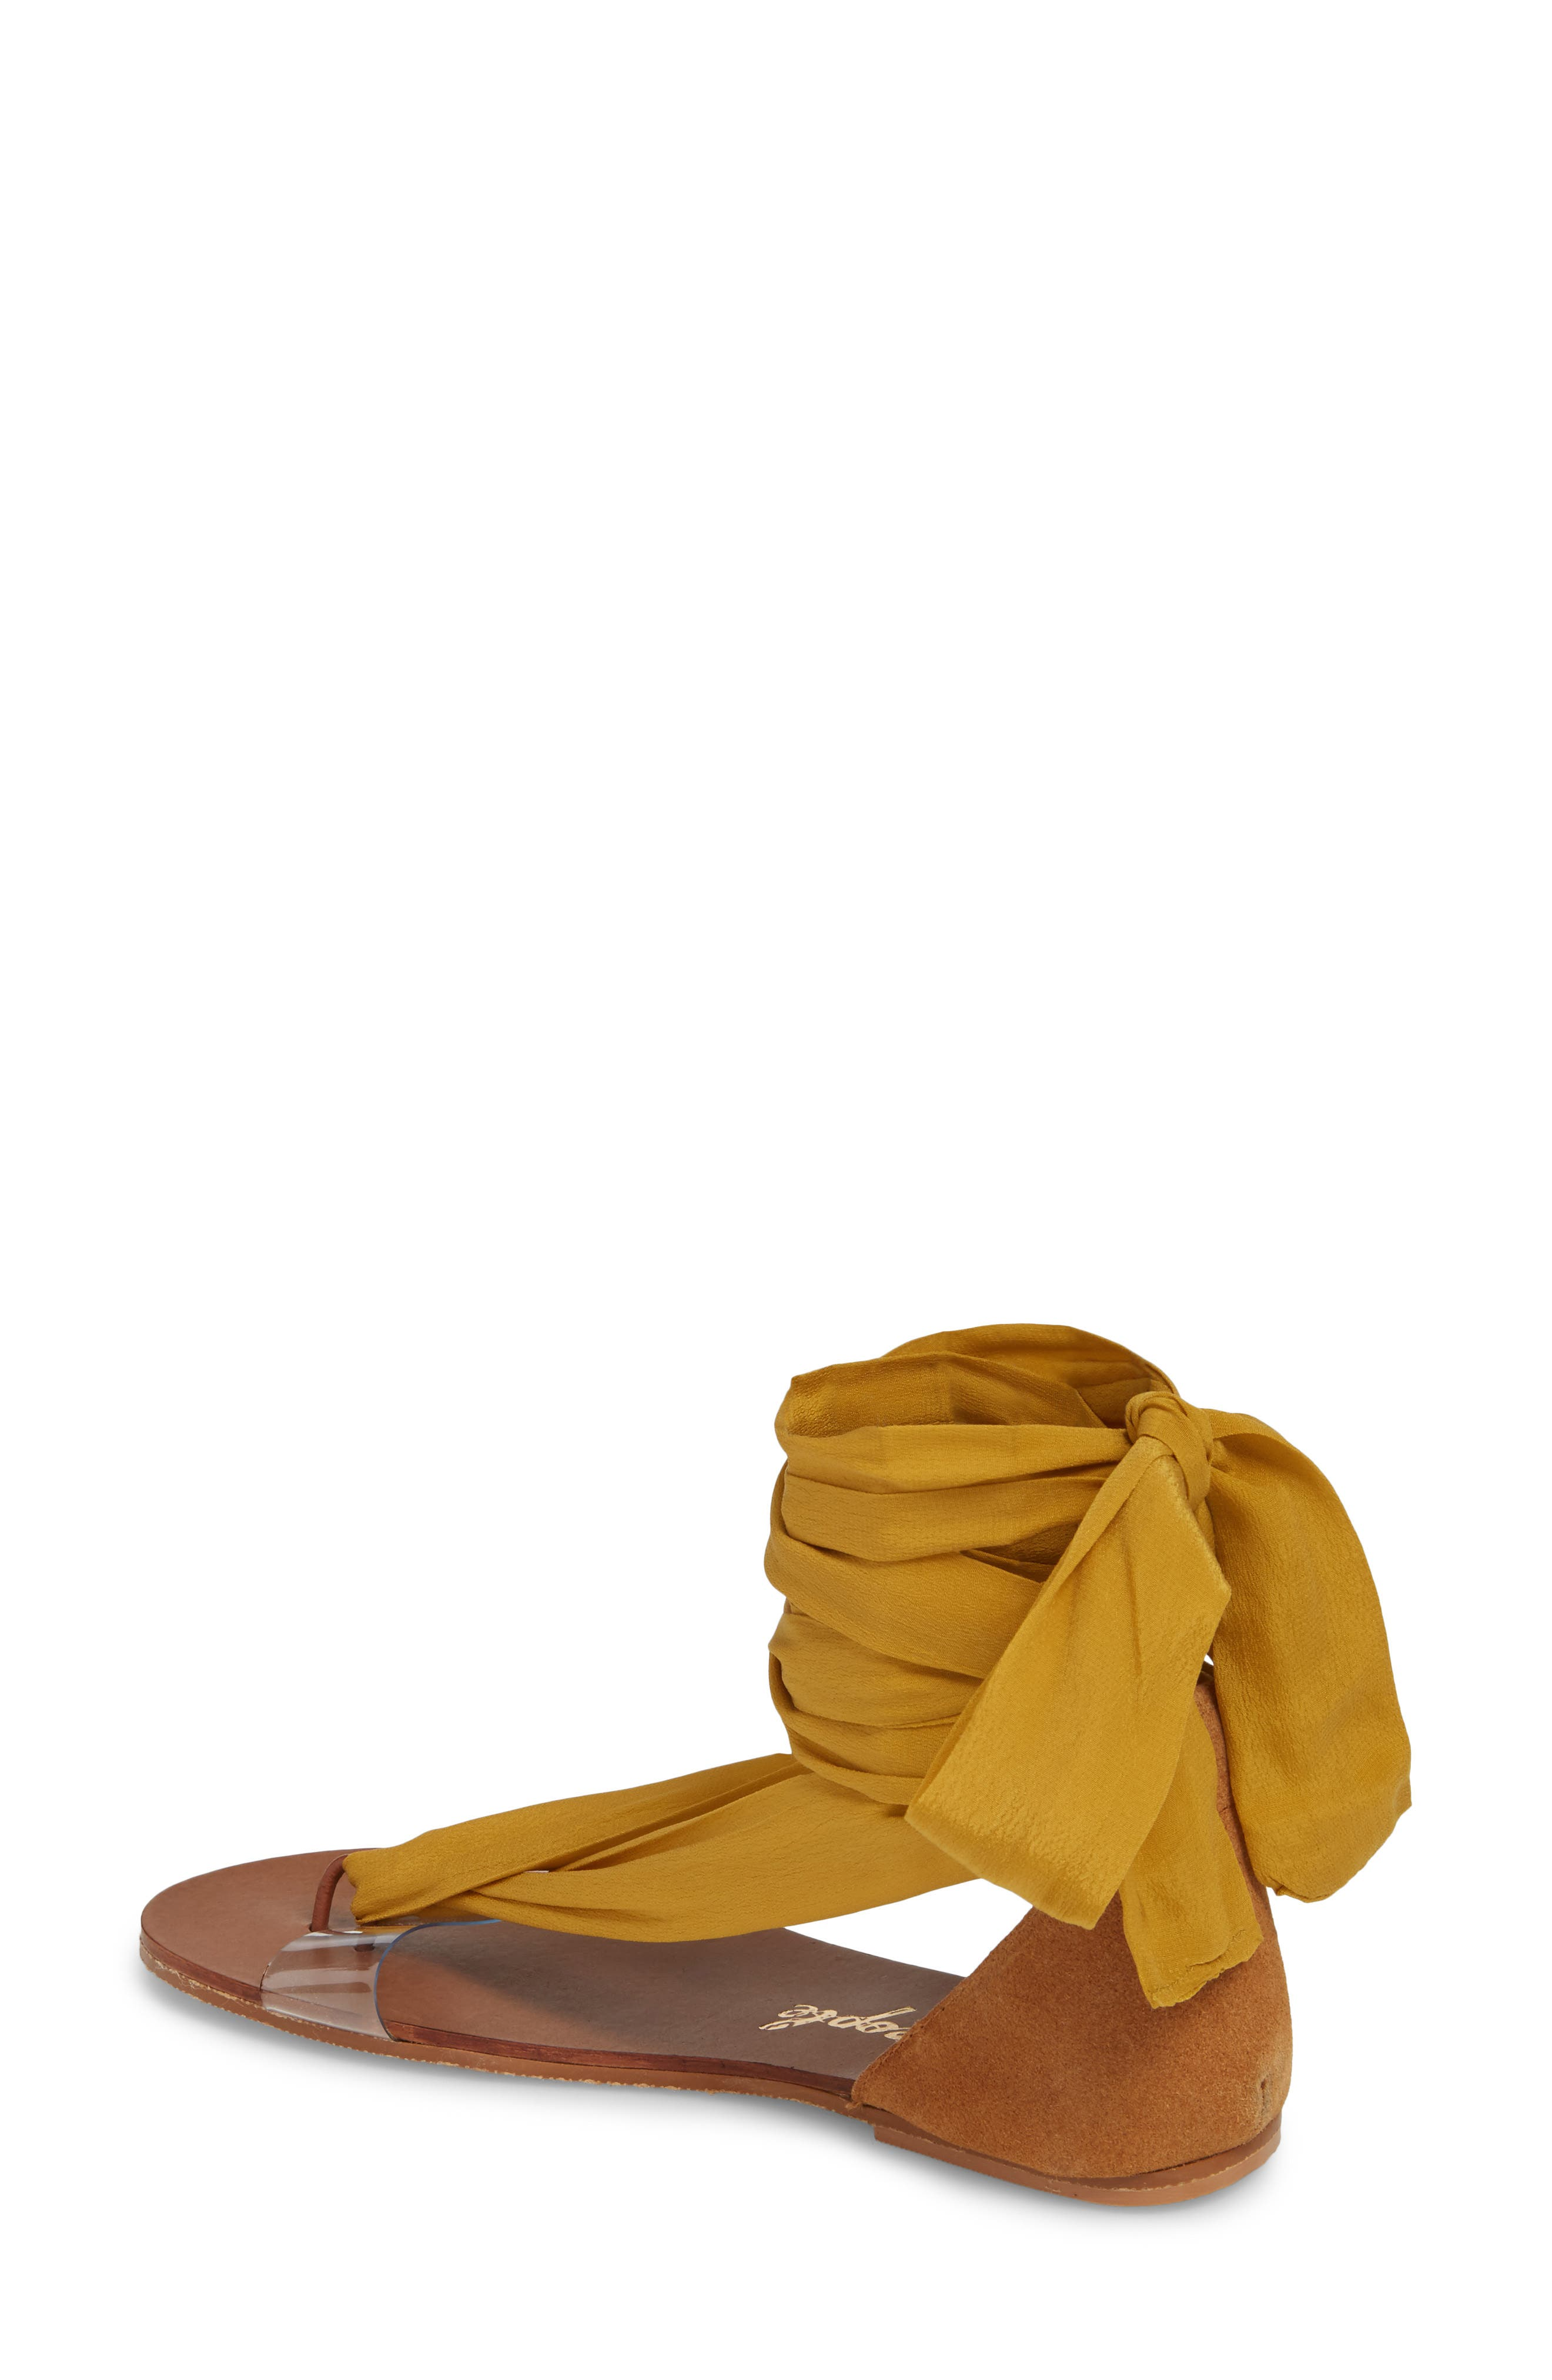 Alternate Image 2  - Free People Barcelona Wrap Sandal (Women)